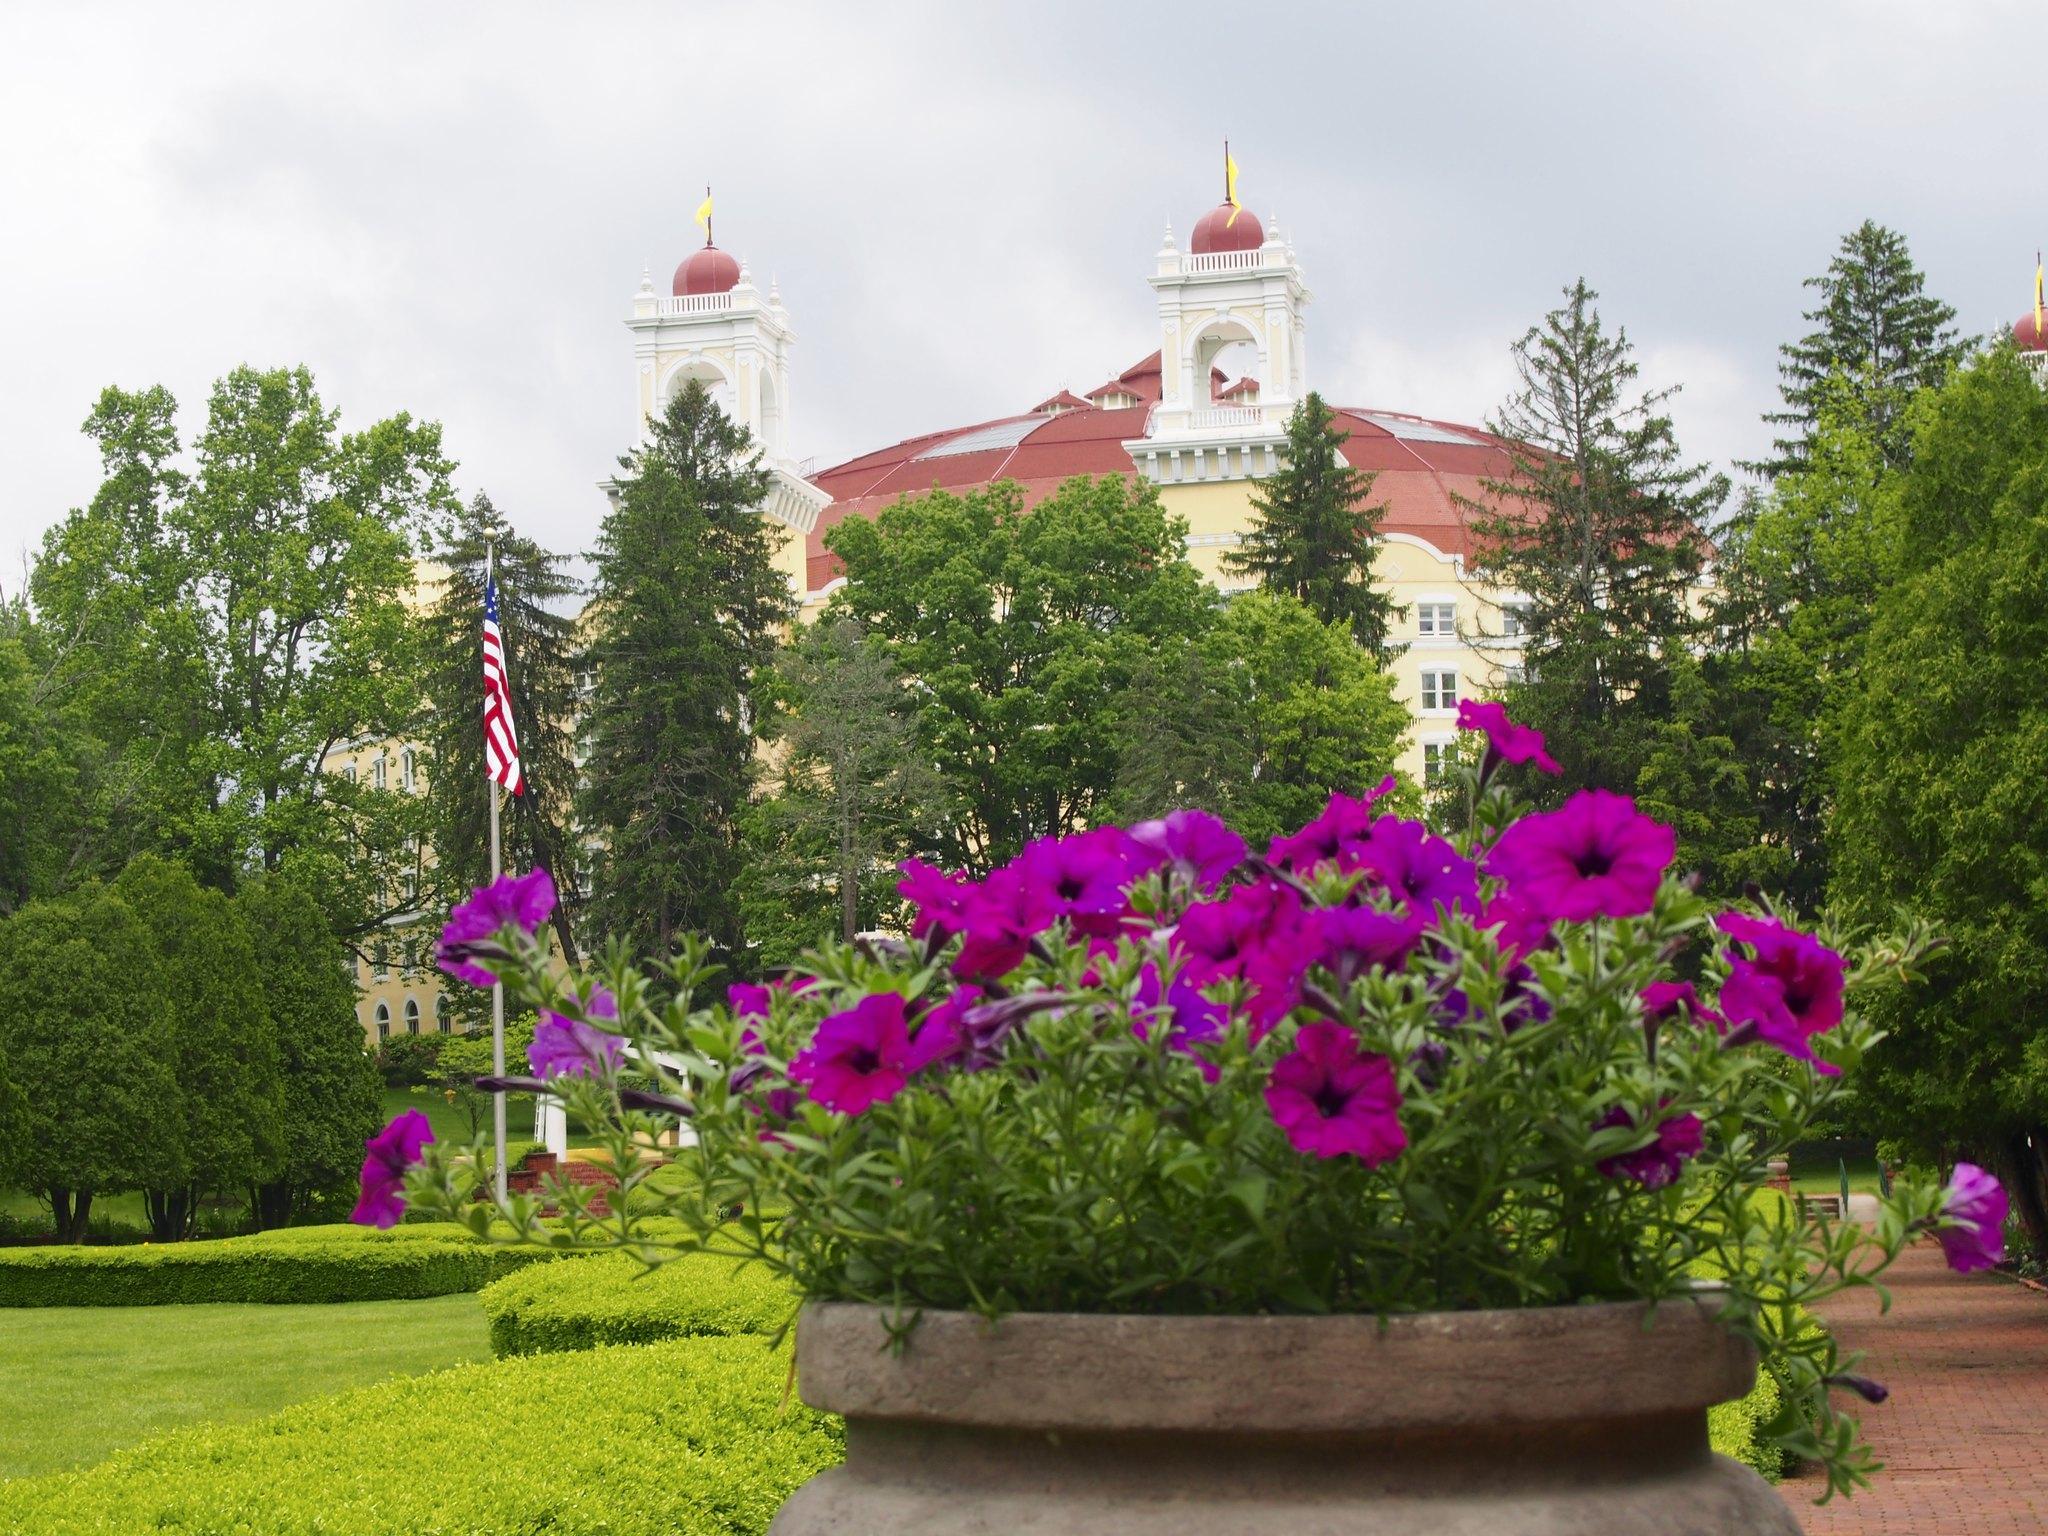 West Baden garden view